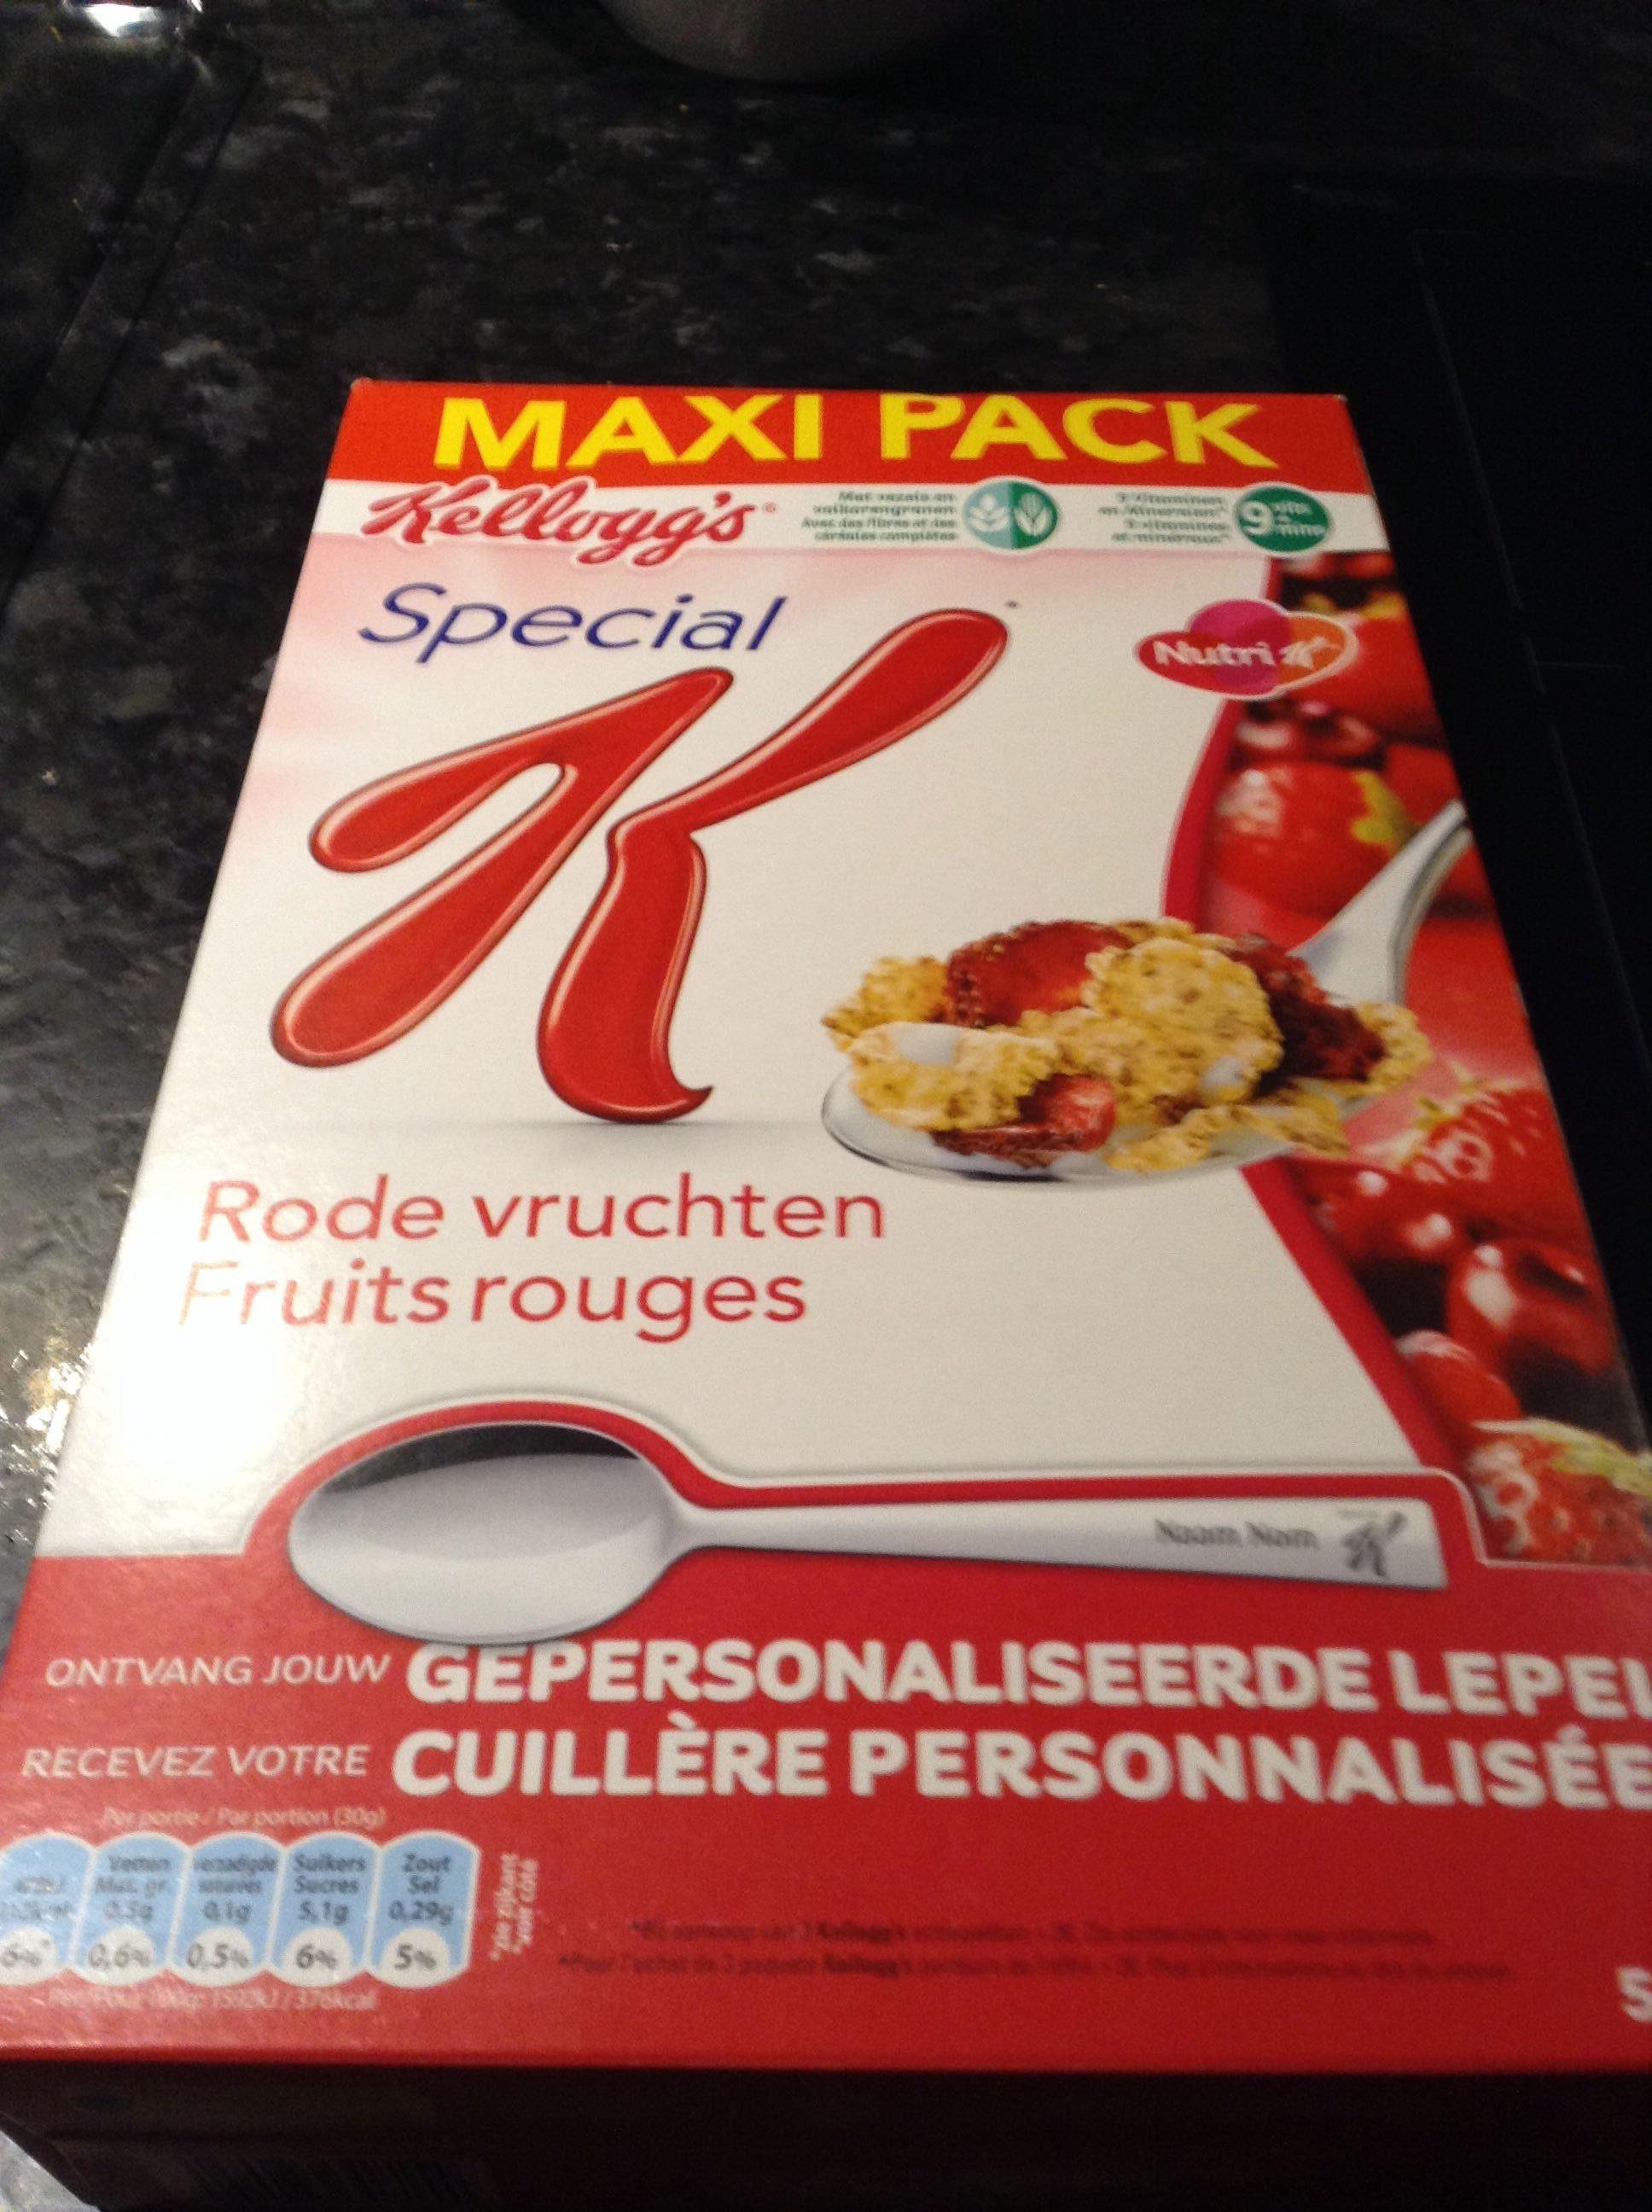 Spécial K - Product